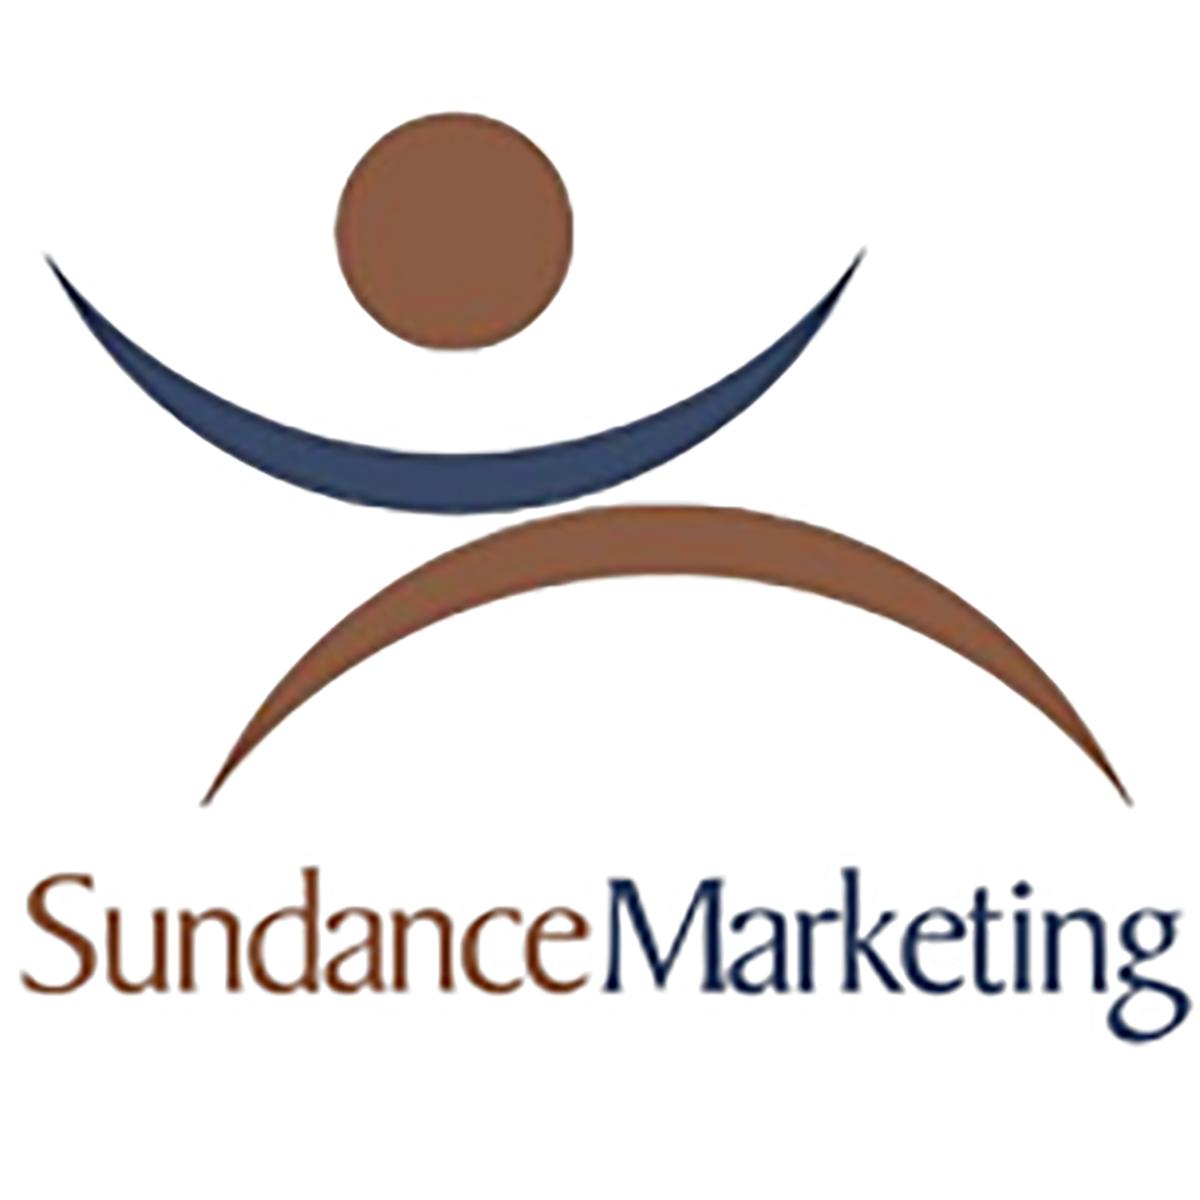 Sundance Marketing, LLC